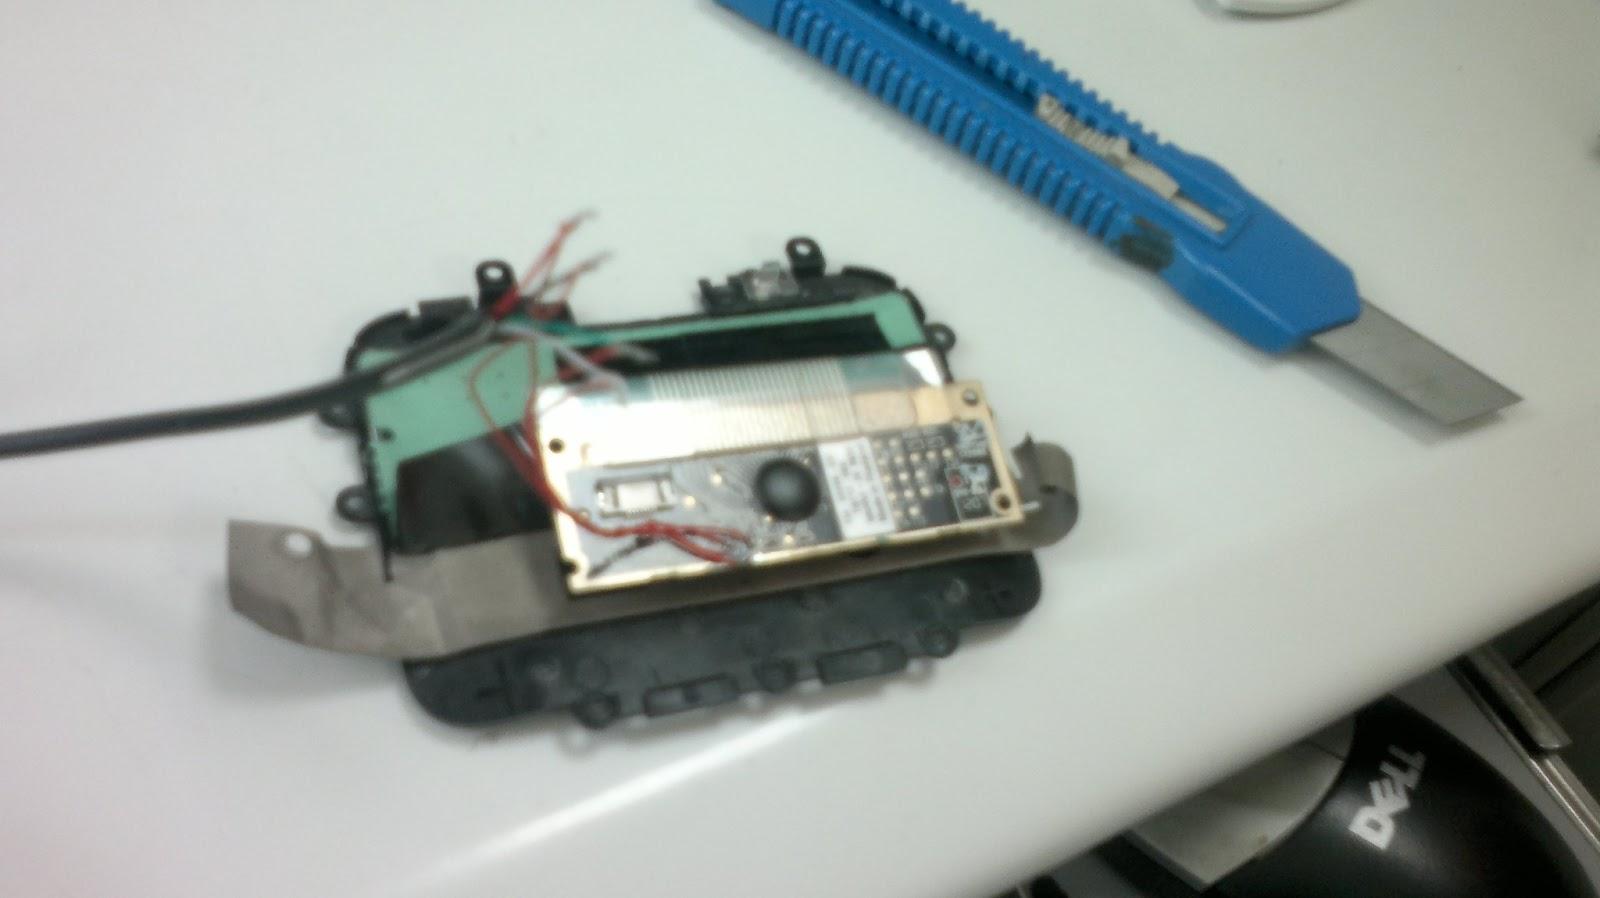 Reveal d\' Technology: Convert laptop track pad to an external USB mouse